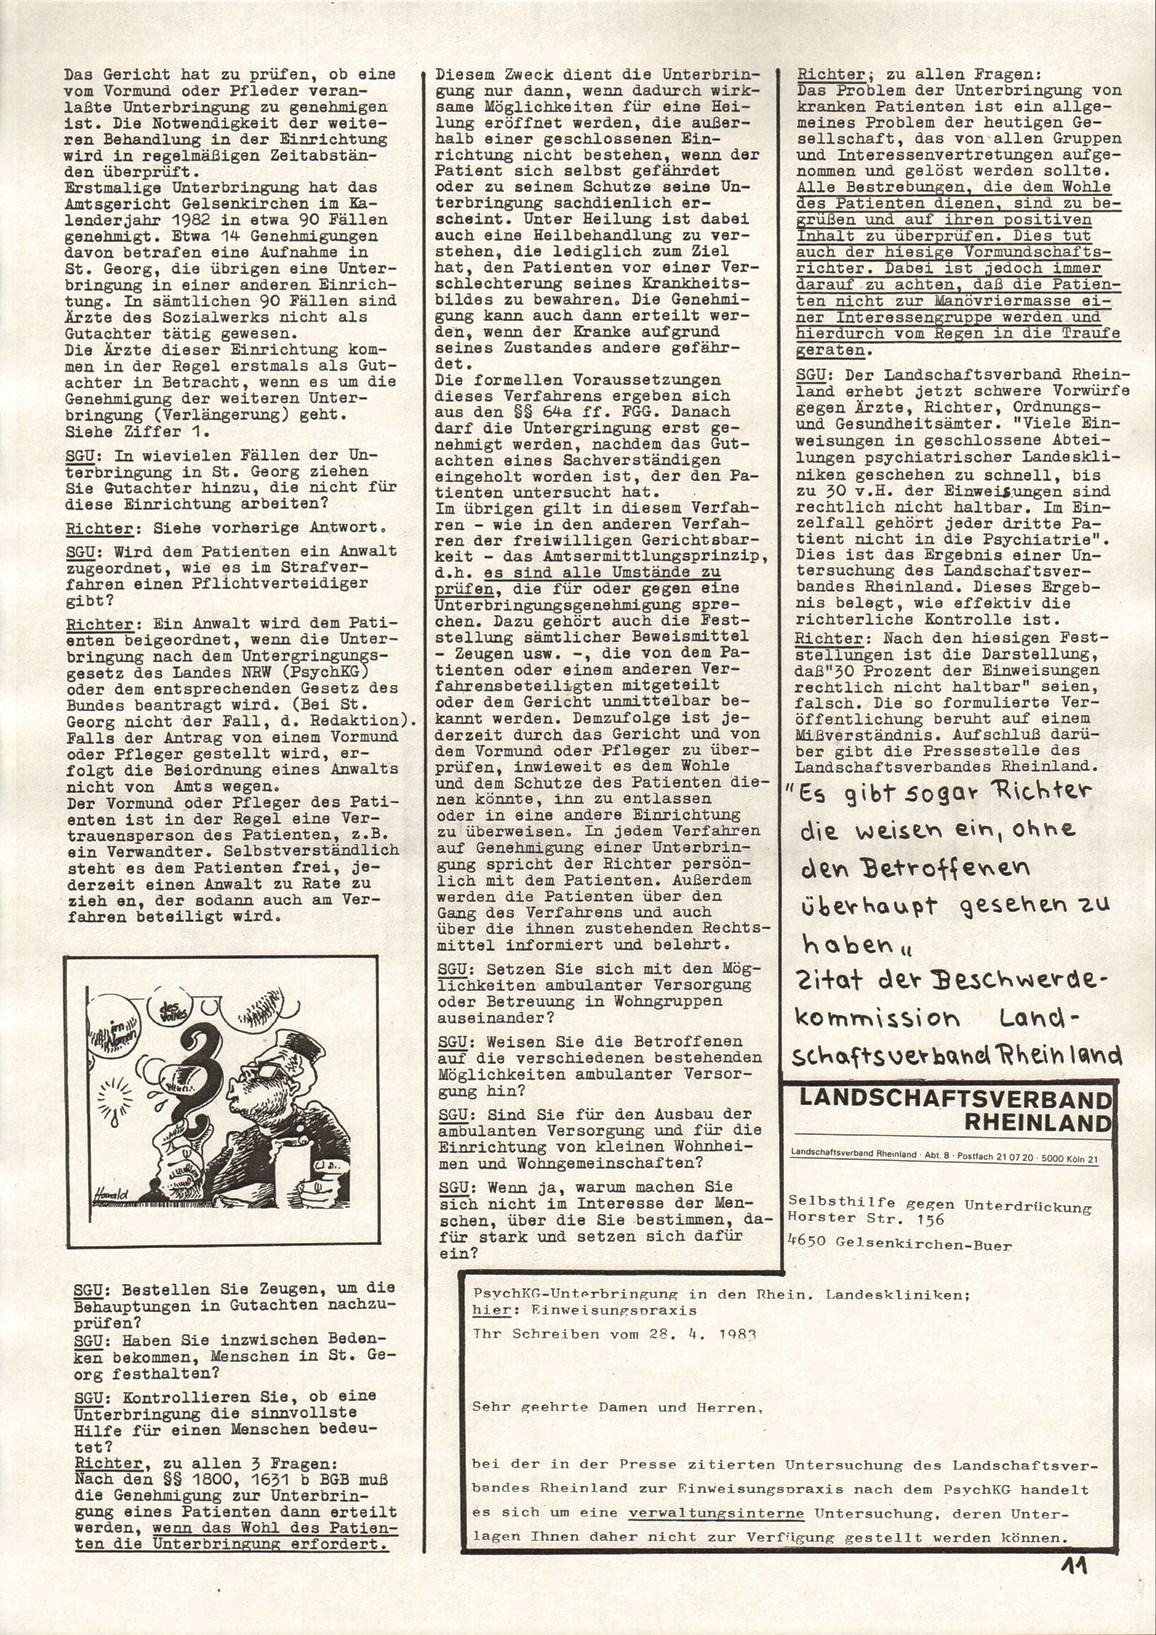 Gelsenkirchen_Selbsthilfe_Blatt_1983_02_11